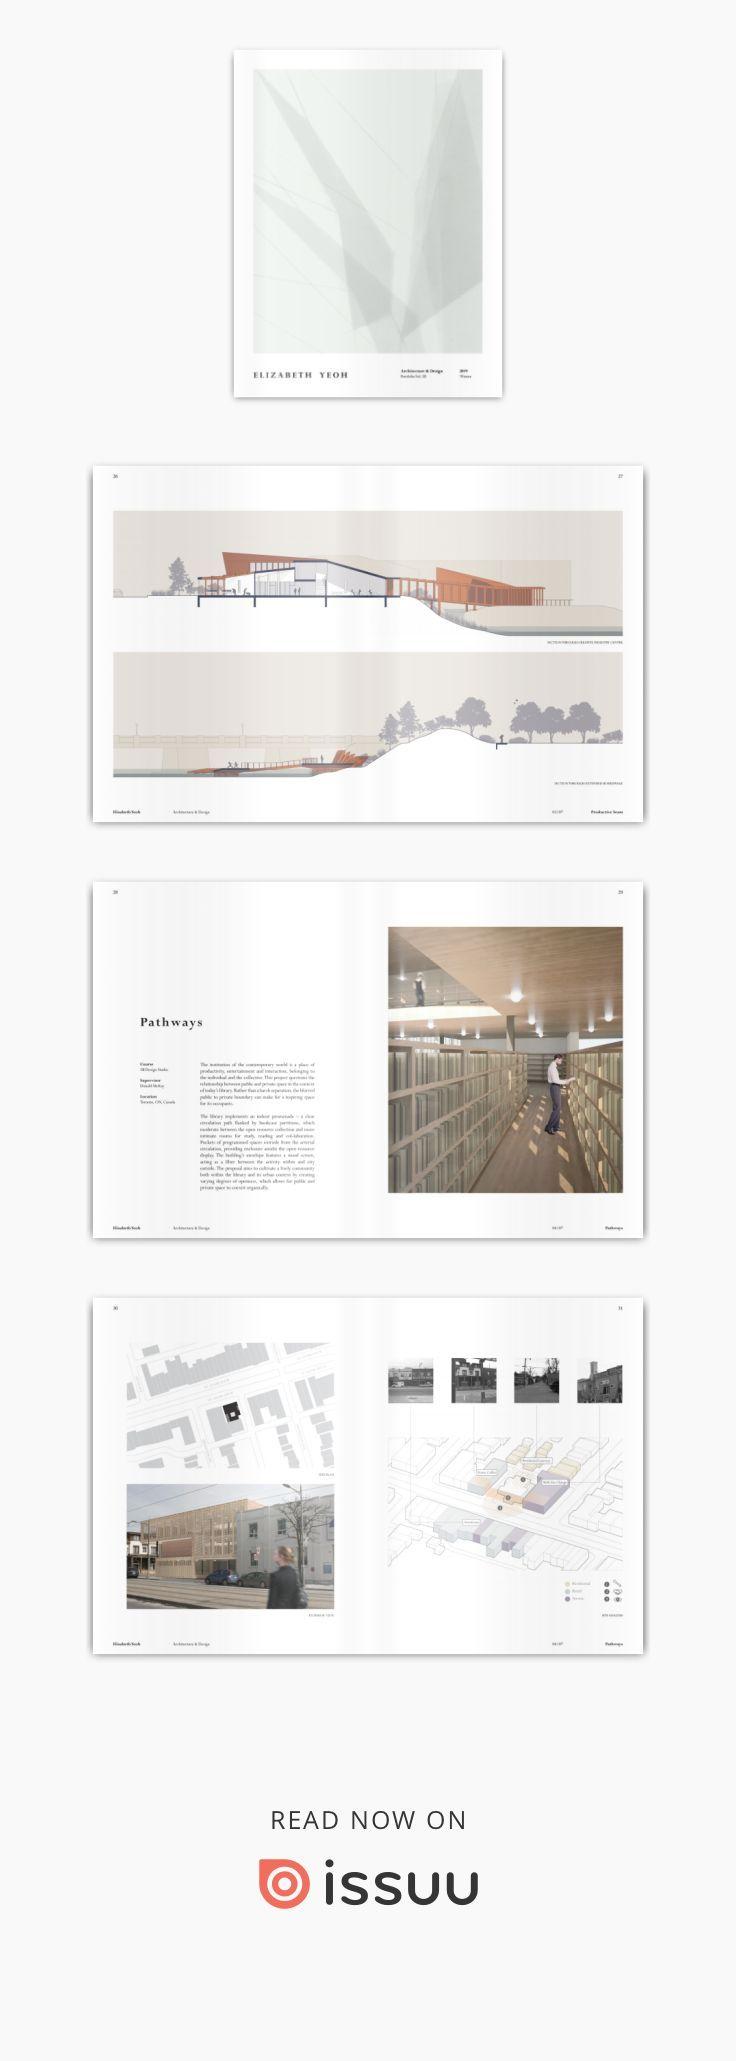 Elizabeth Yeoh | Architecture & Design 2019